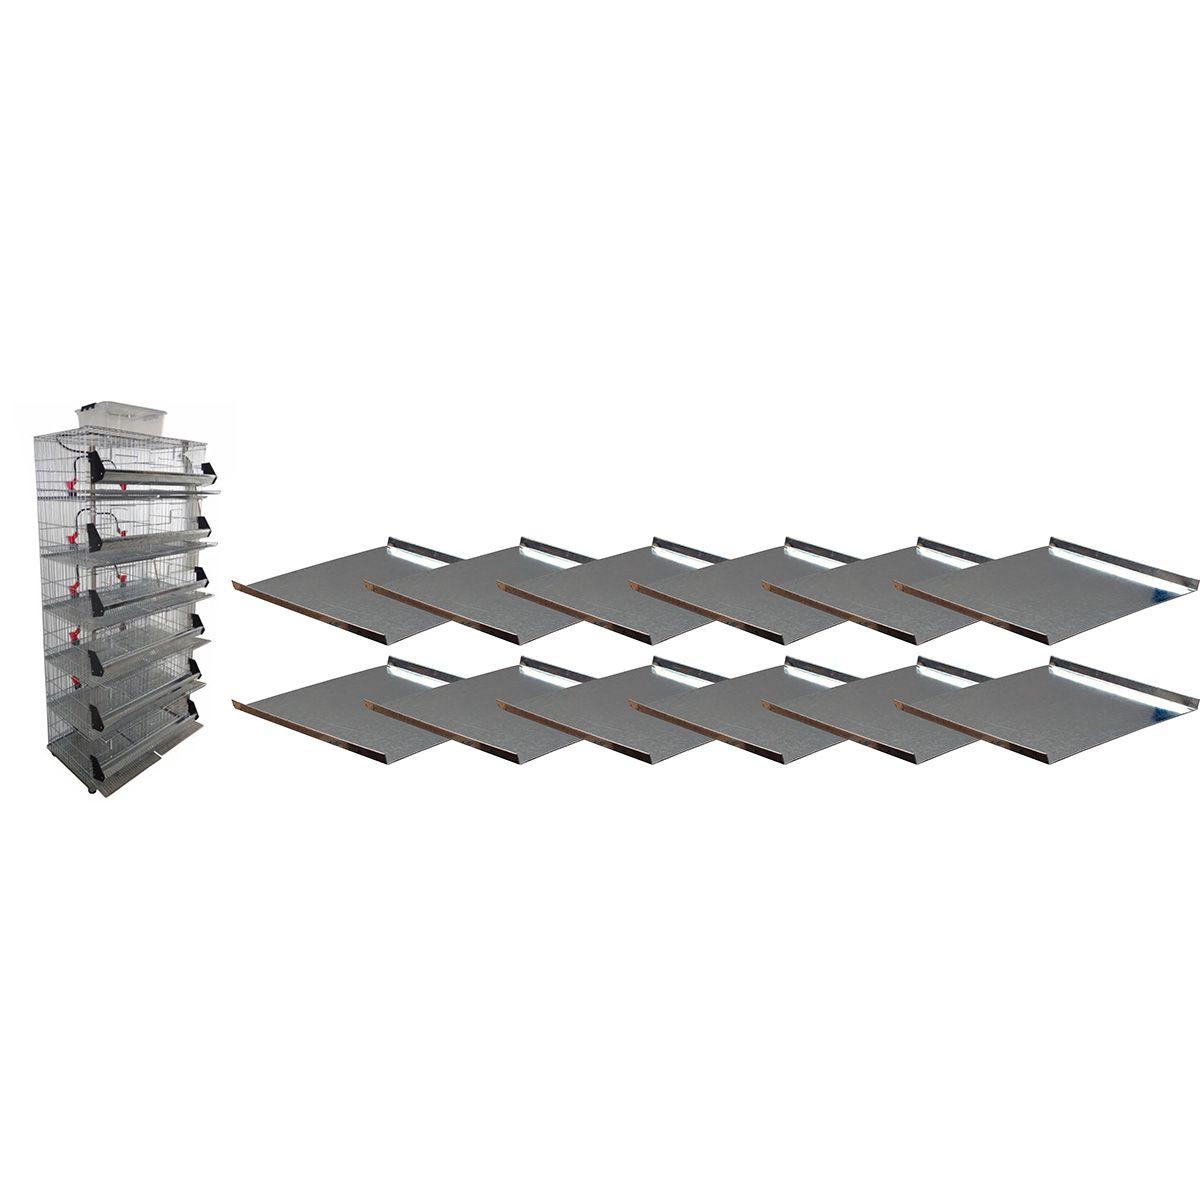 Kit com 12 bandejas - Bateria de 12 gaiolas para codorna